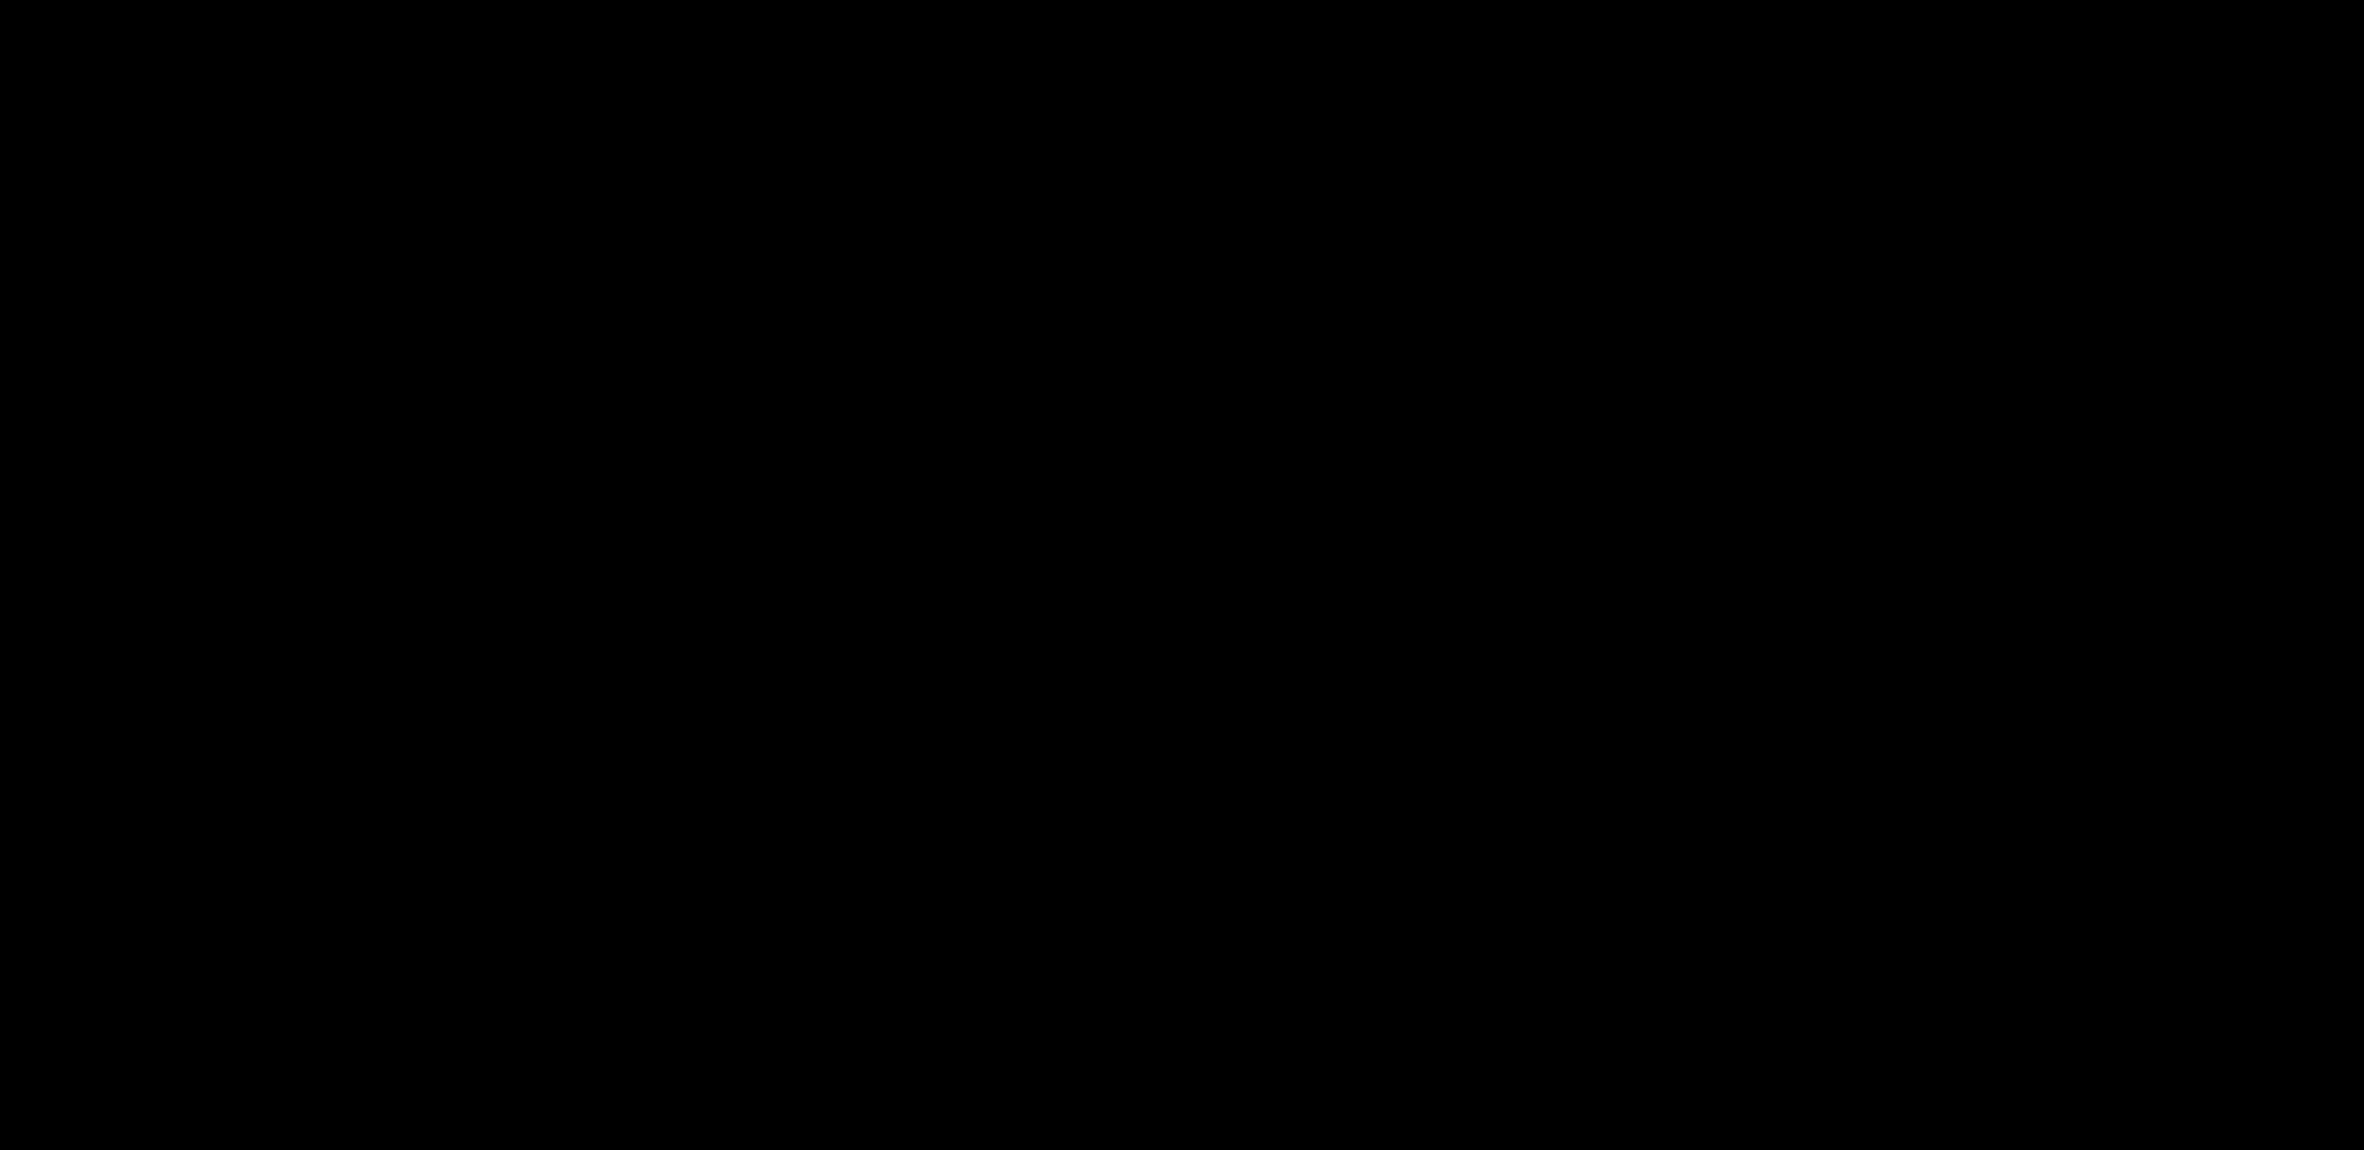 Bat silhouette clip.